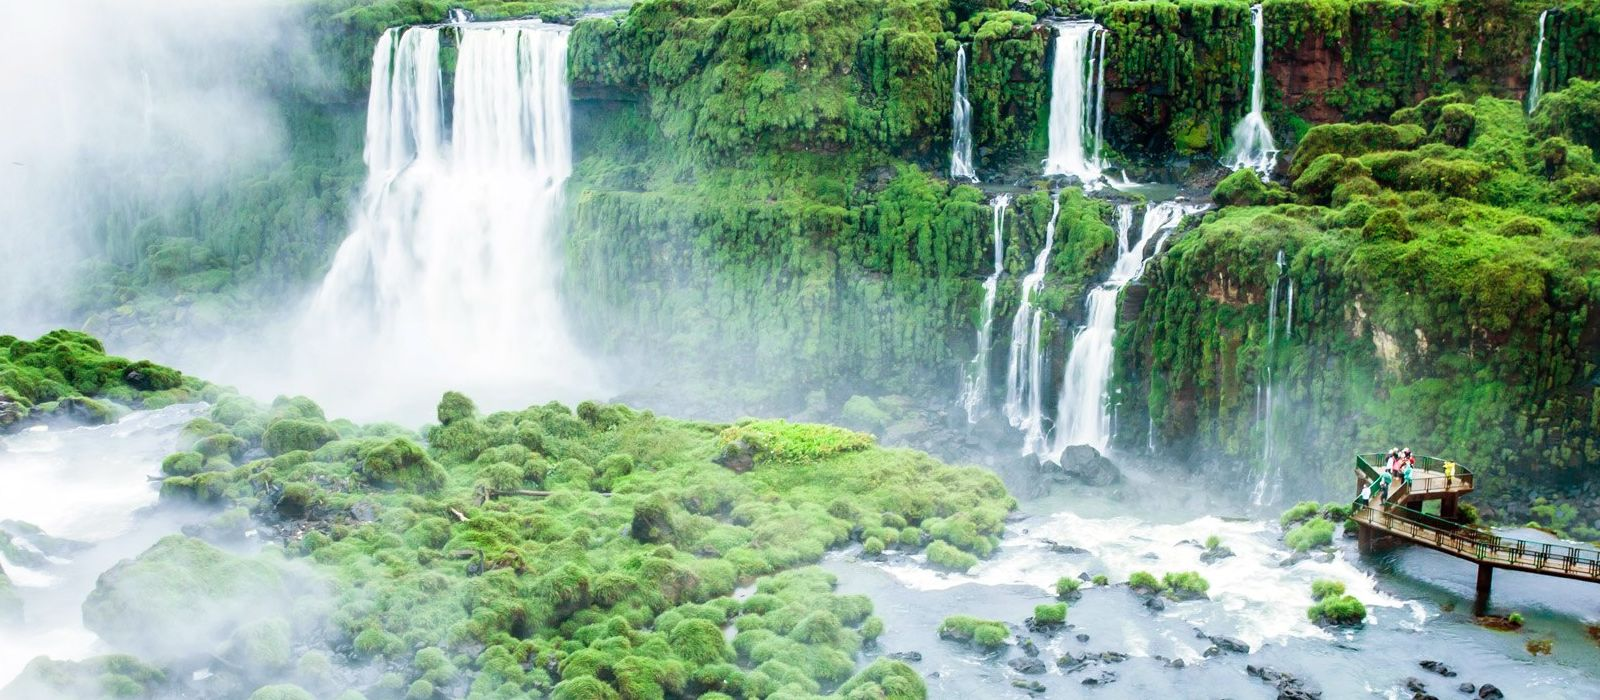 Destination Foz do Iguacu Brazil